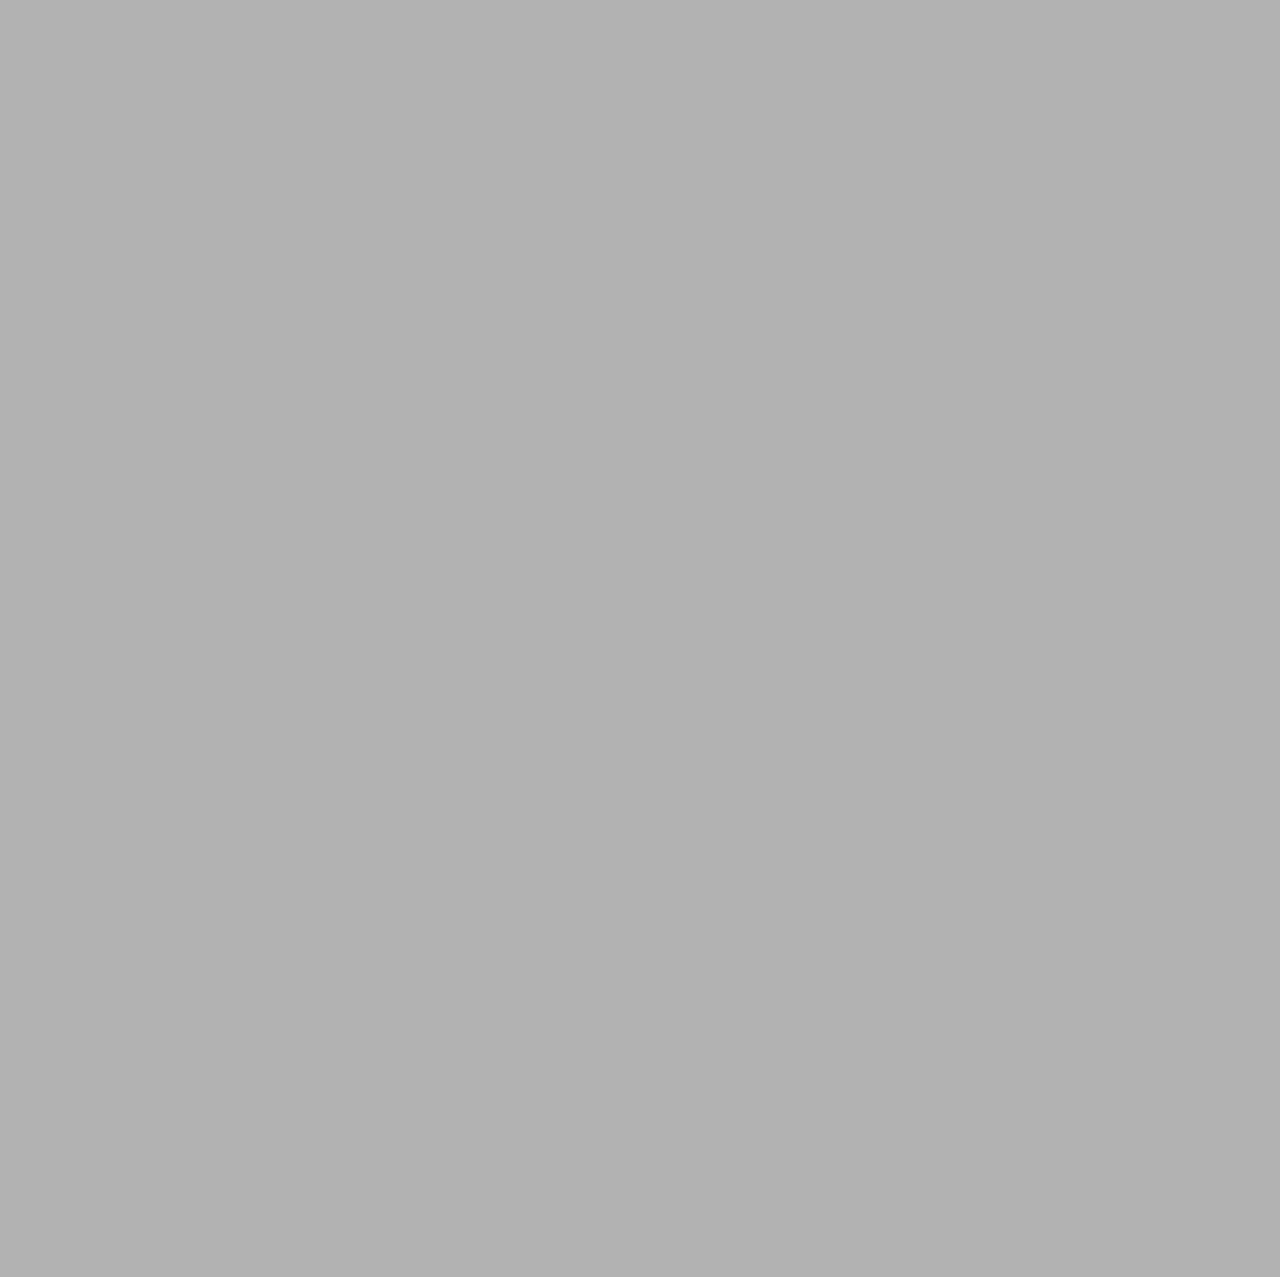 60f4fbf8 CMYK: 0/0/0/30. HEX: #b3b3b3. RGB: 179/179/179